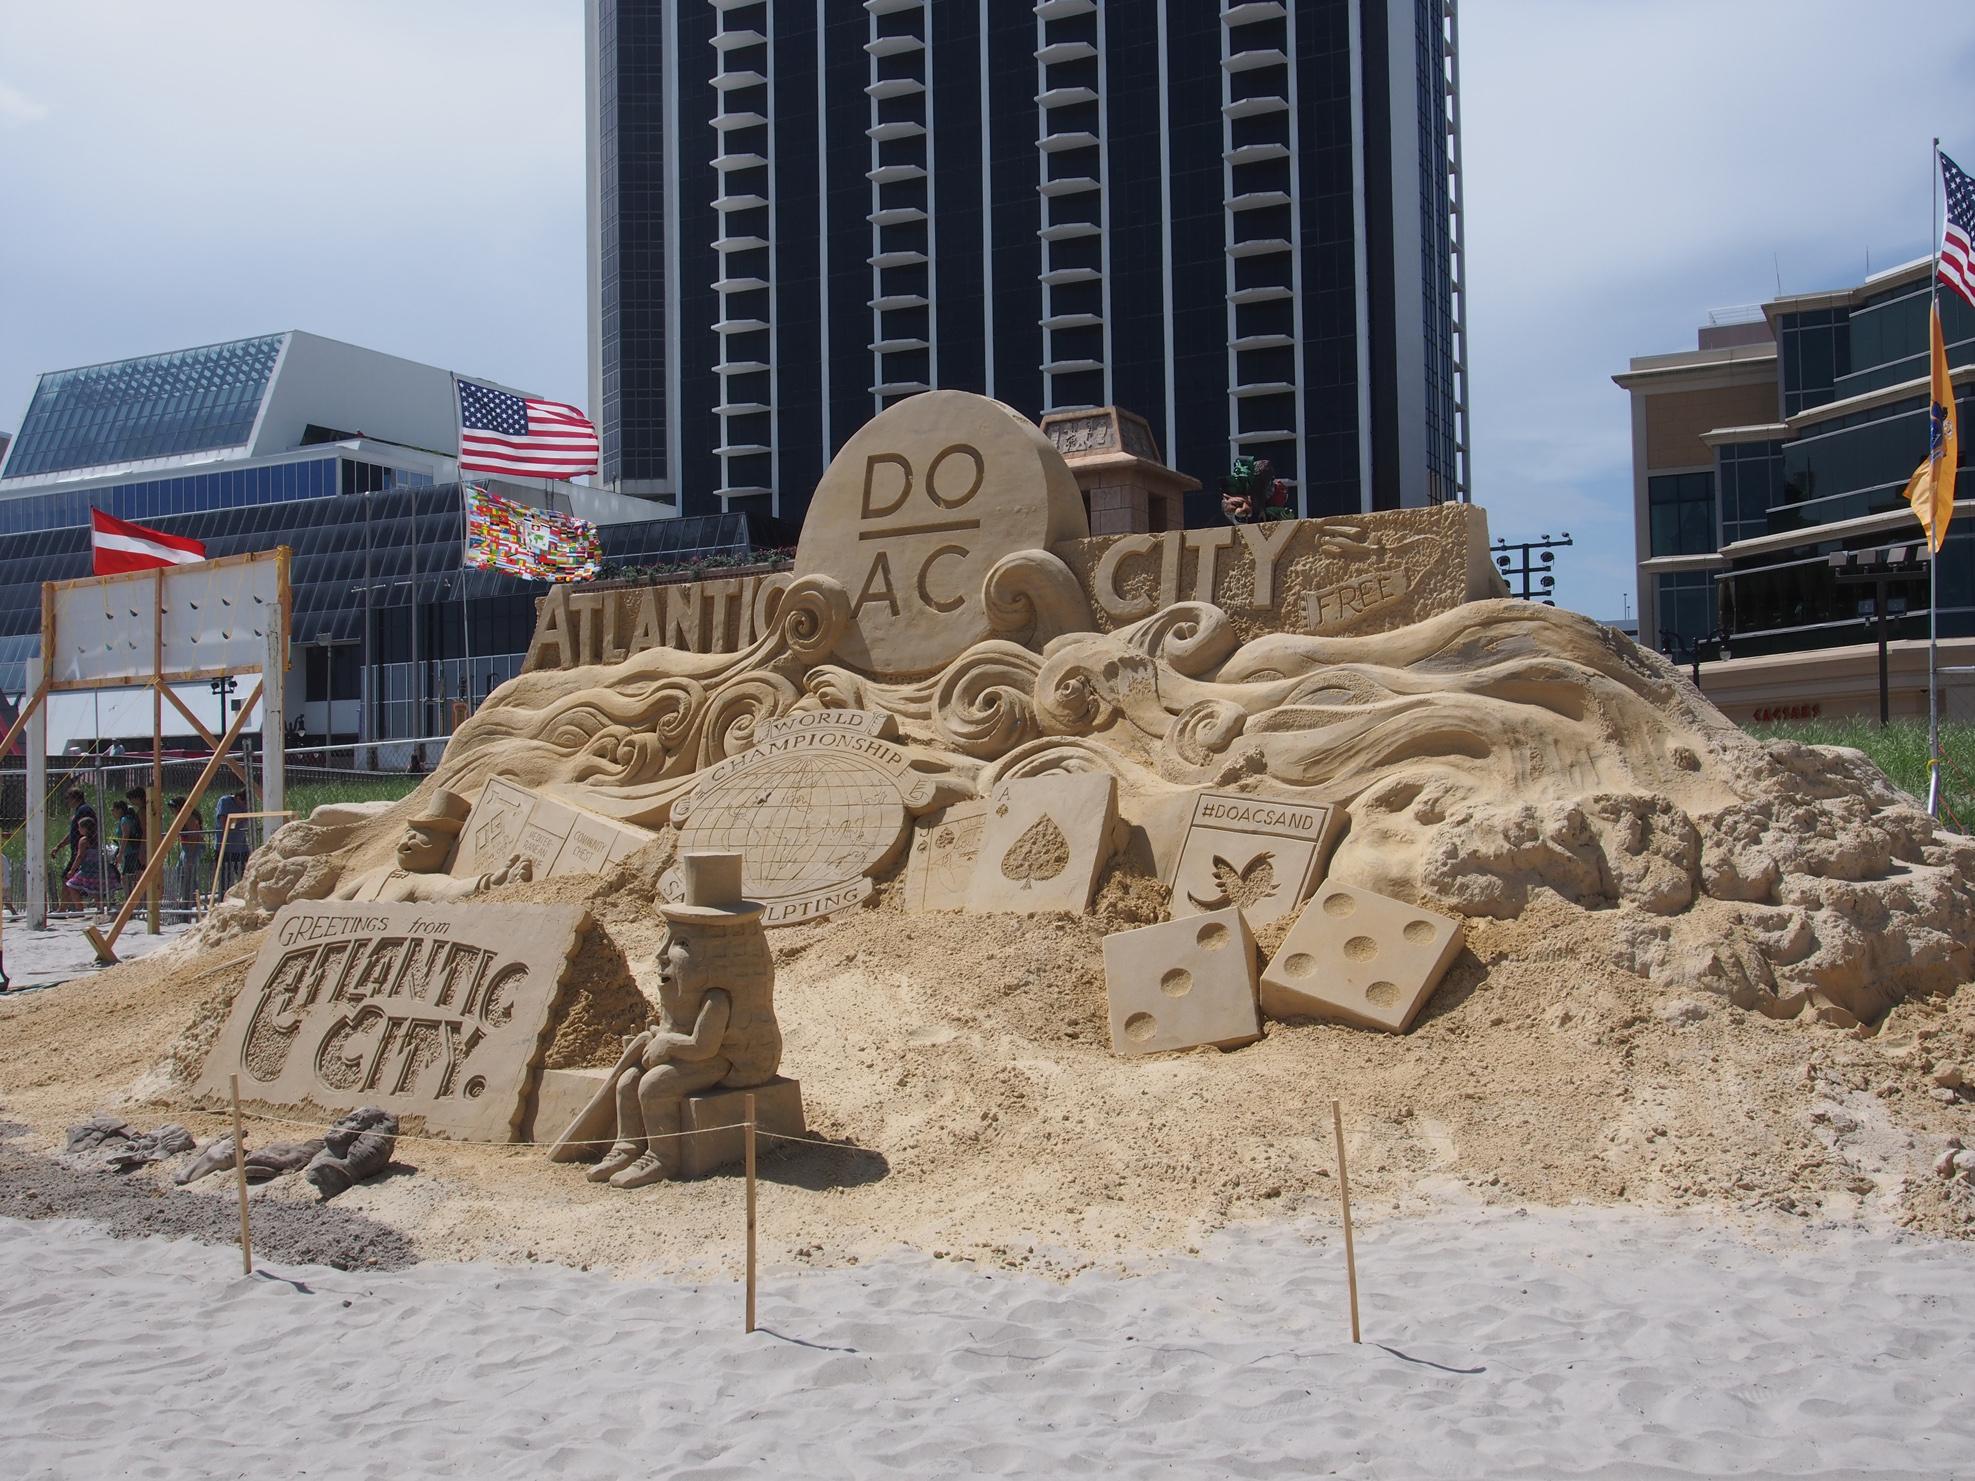 sand_atlantic city 02.jpg